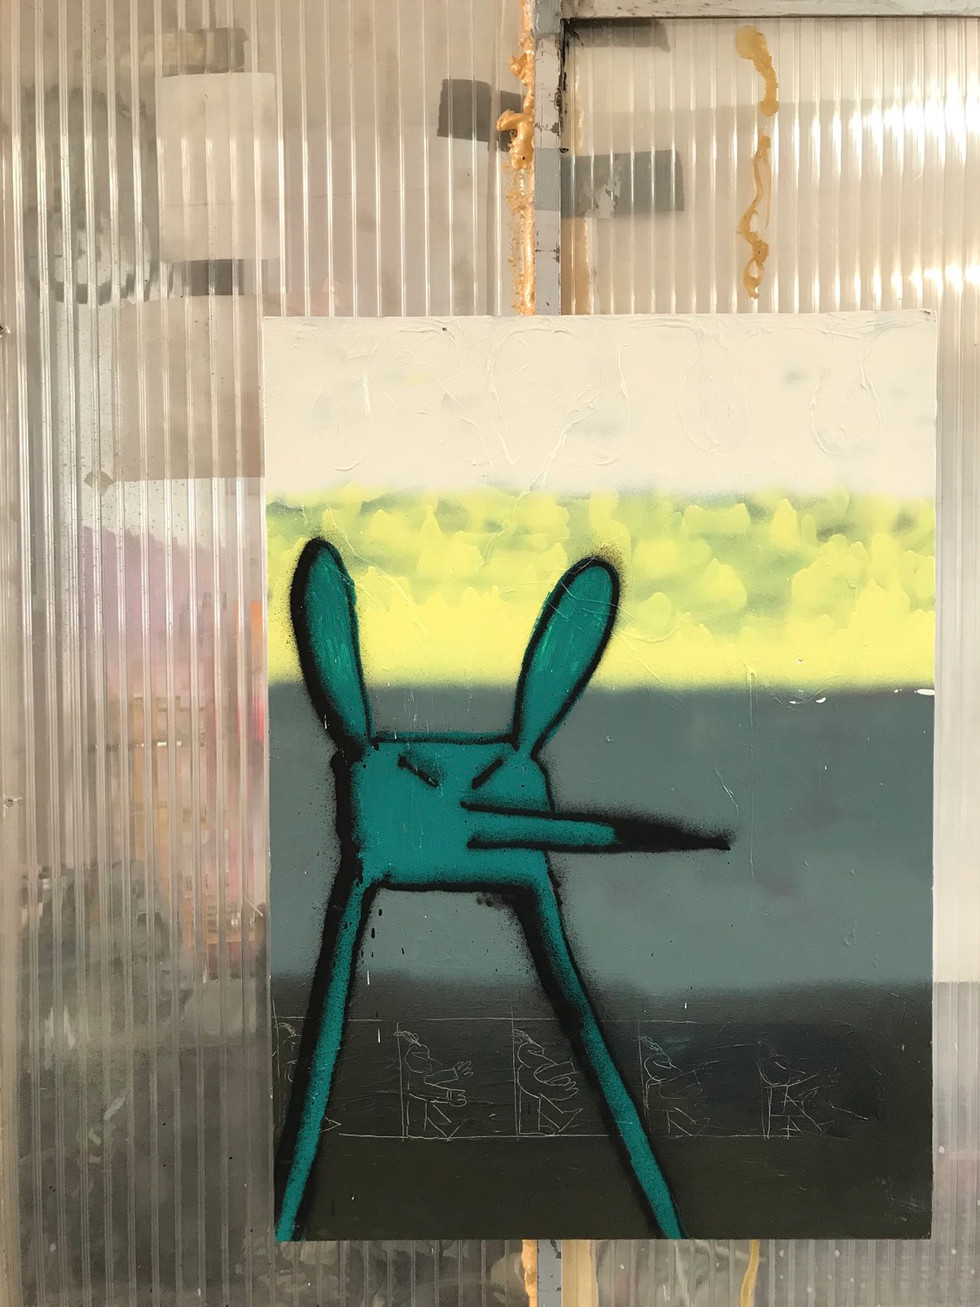 O.T. / 2019 /70x50cm / Acryl, Lack auf Leinwand  ---  Grand Jus / Gruppenausstellung mit u.a. Markus Armbrecht, Pascal Brinkmann, Regine Schulz / Hamburg 2019